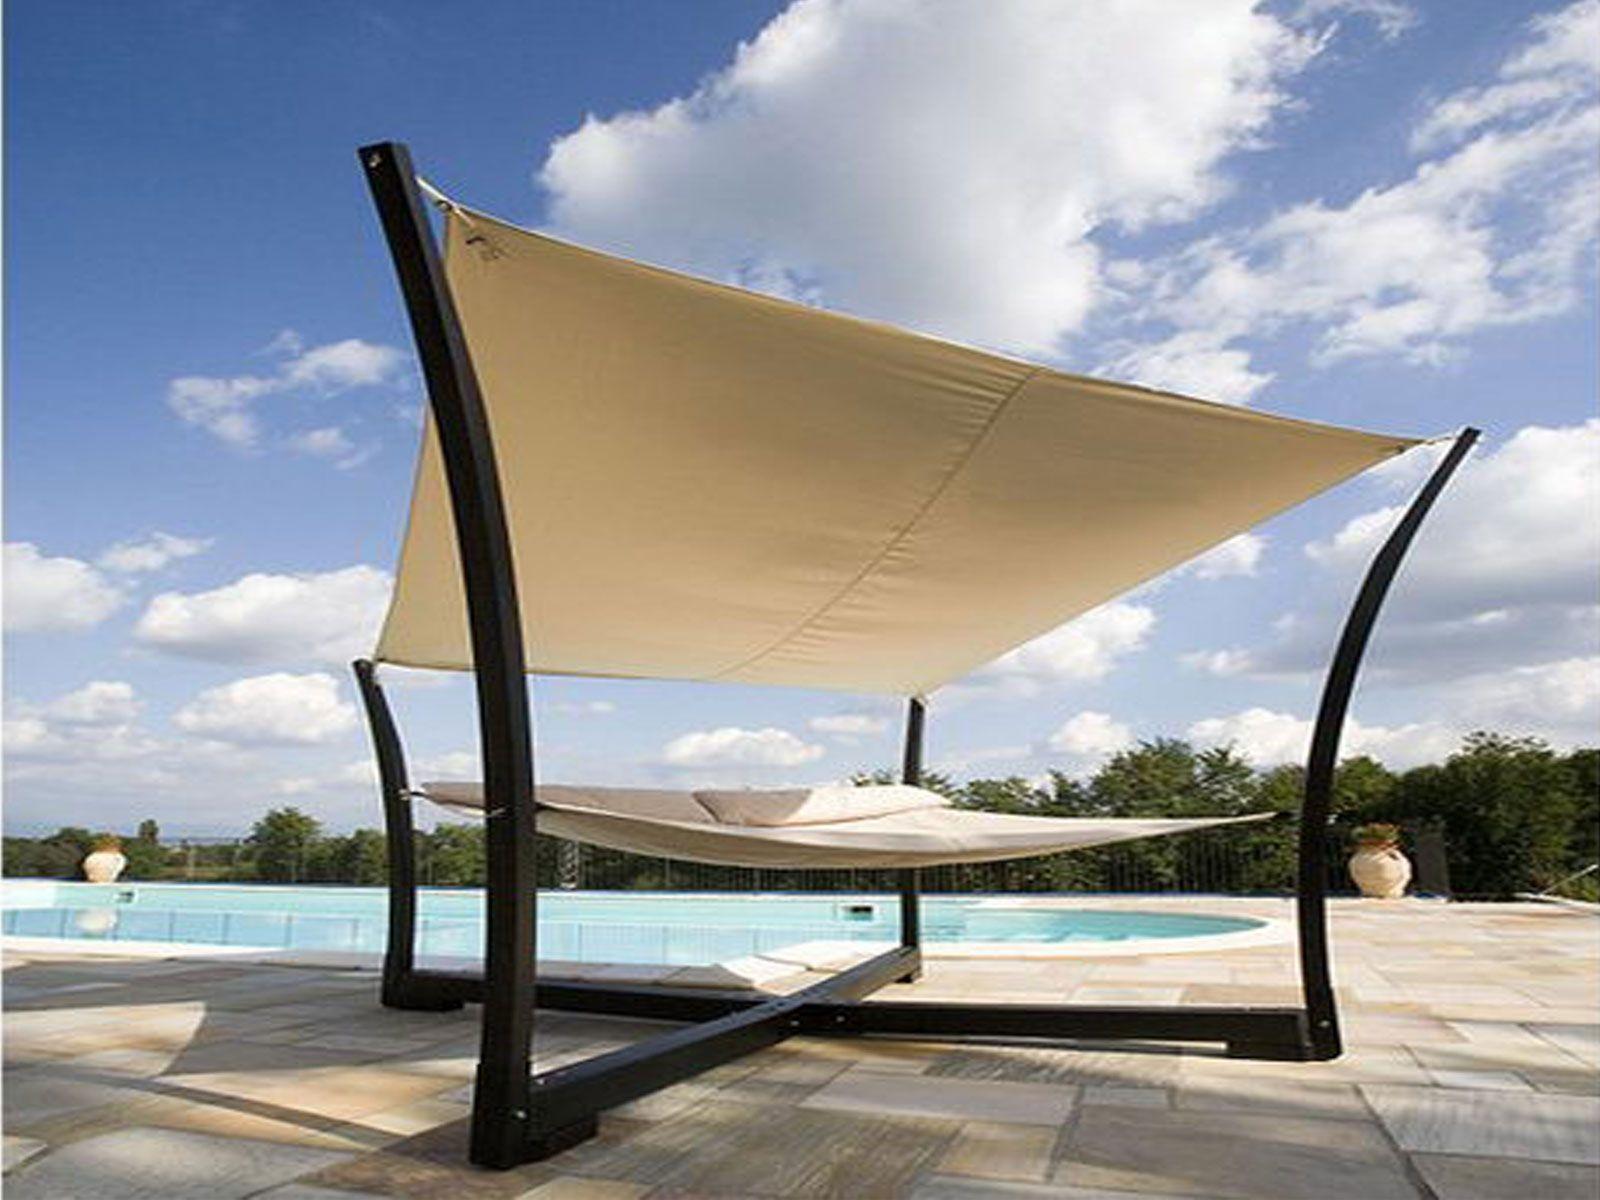 outdoor buy cheap com swing garden nicolasprudhon seat wood larch wooden bench hammock